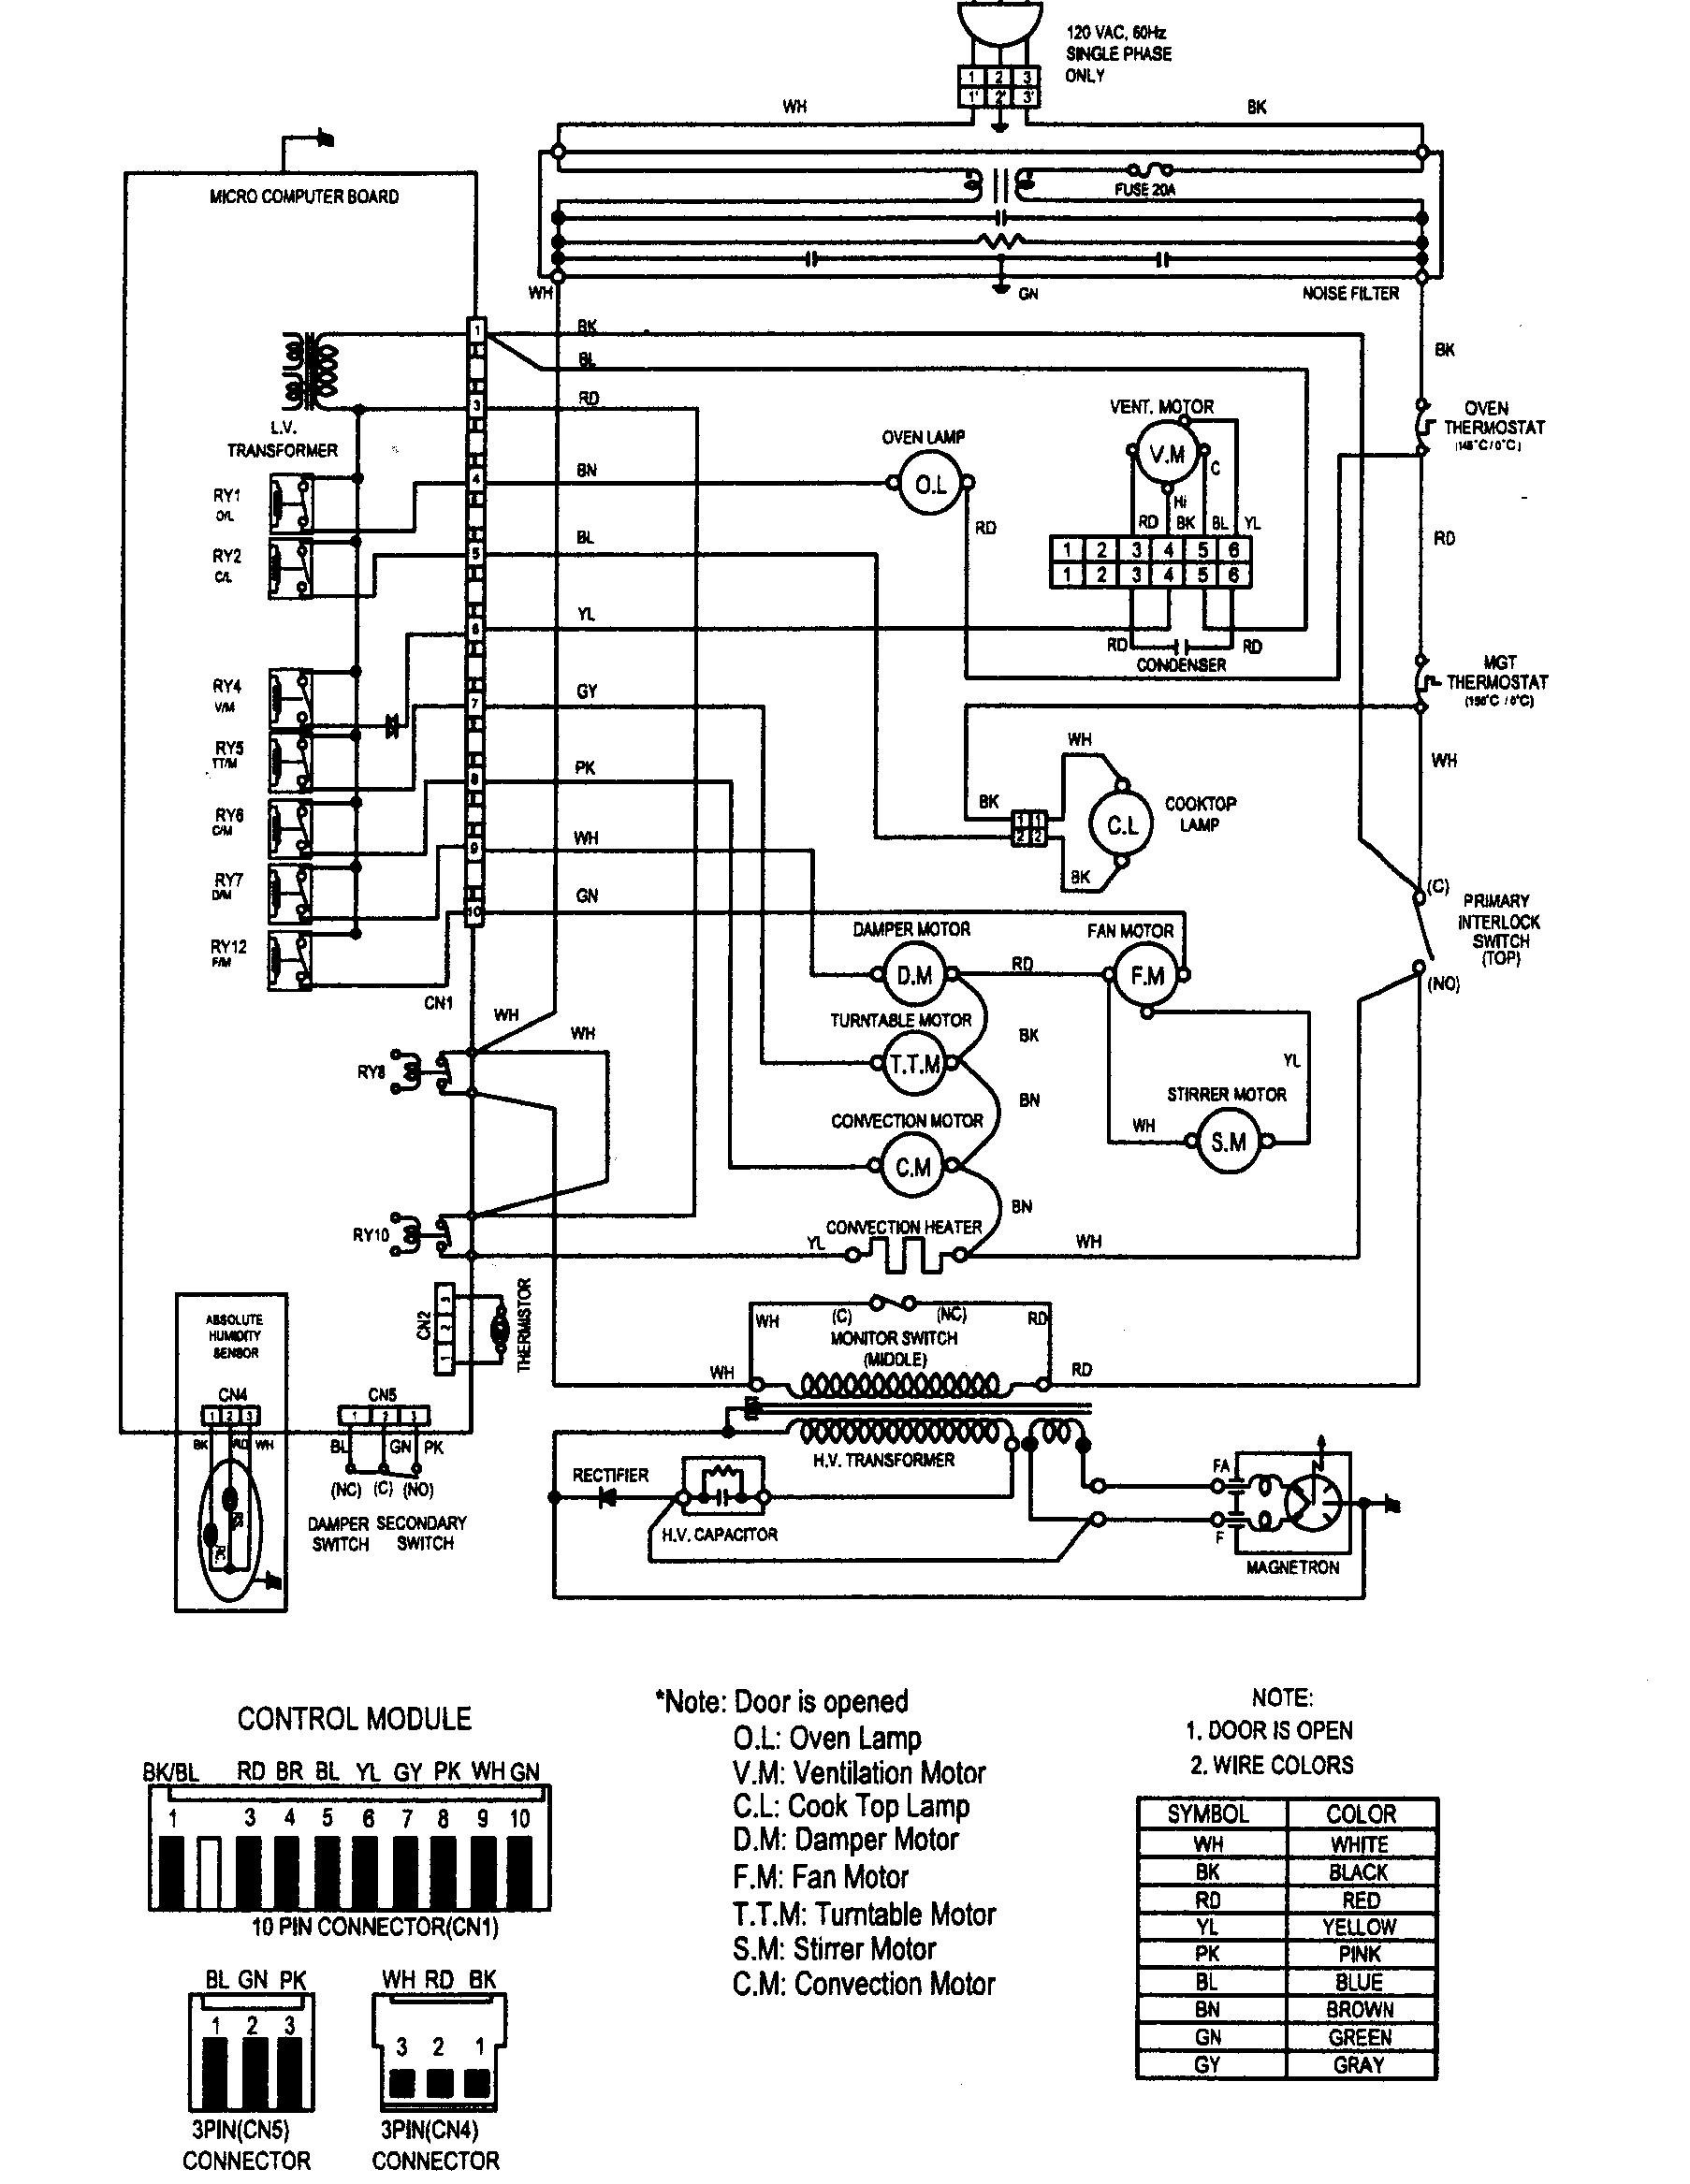 whirlpool wiring schematic gss30c6eyb00